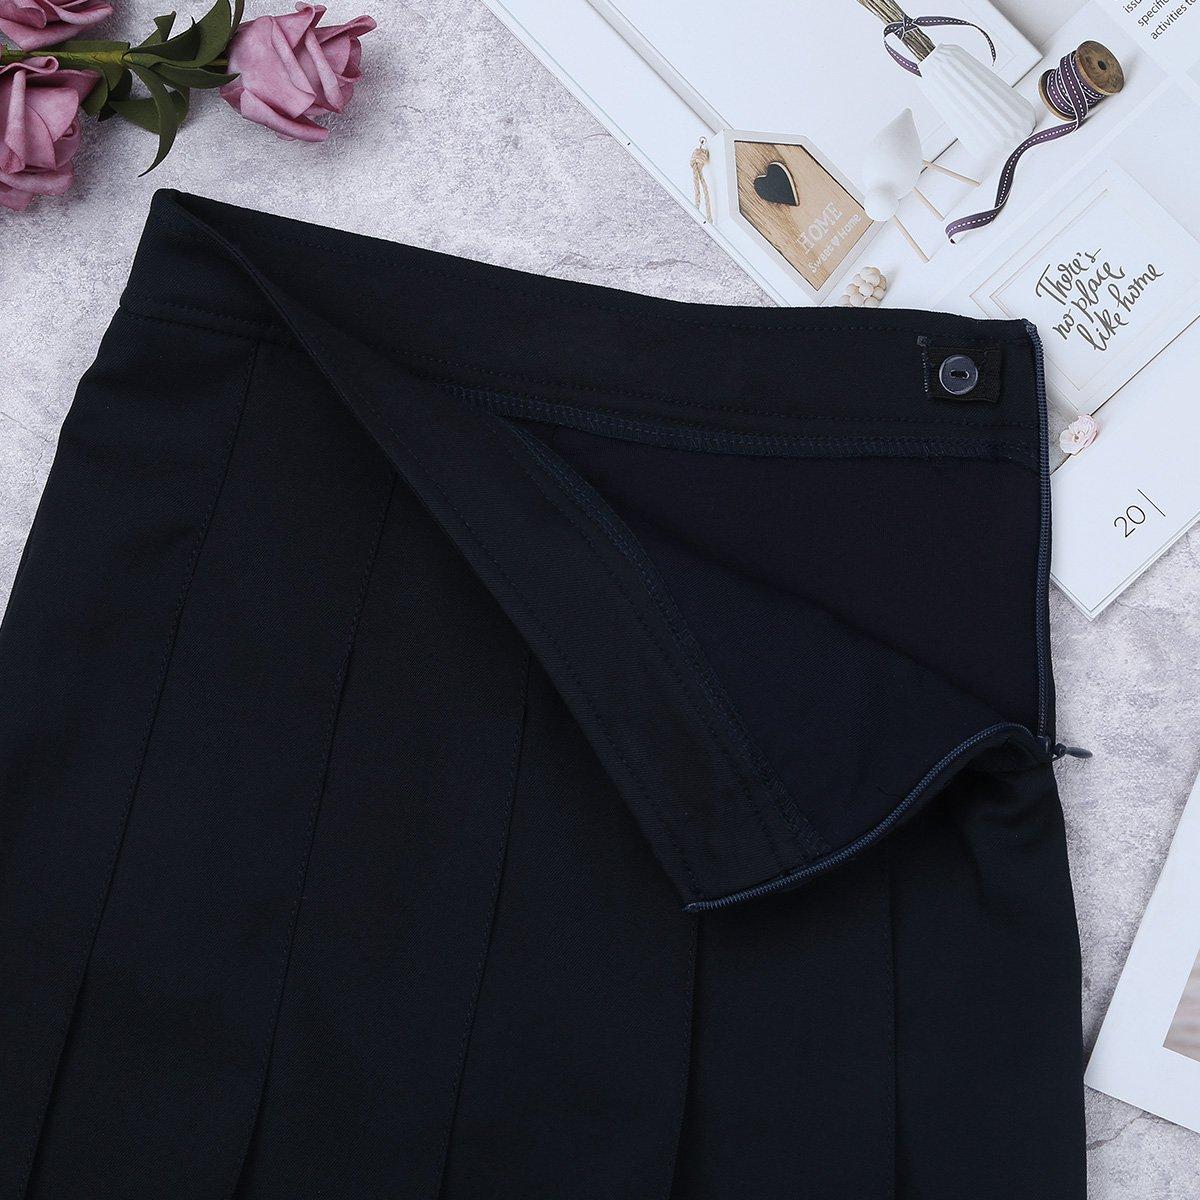 YiZYiF Kids Girls Elastic Soft Plain Uniform Pleated Skirt